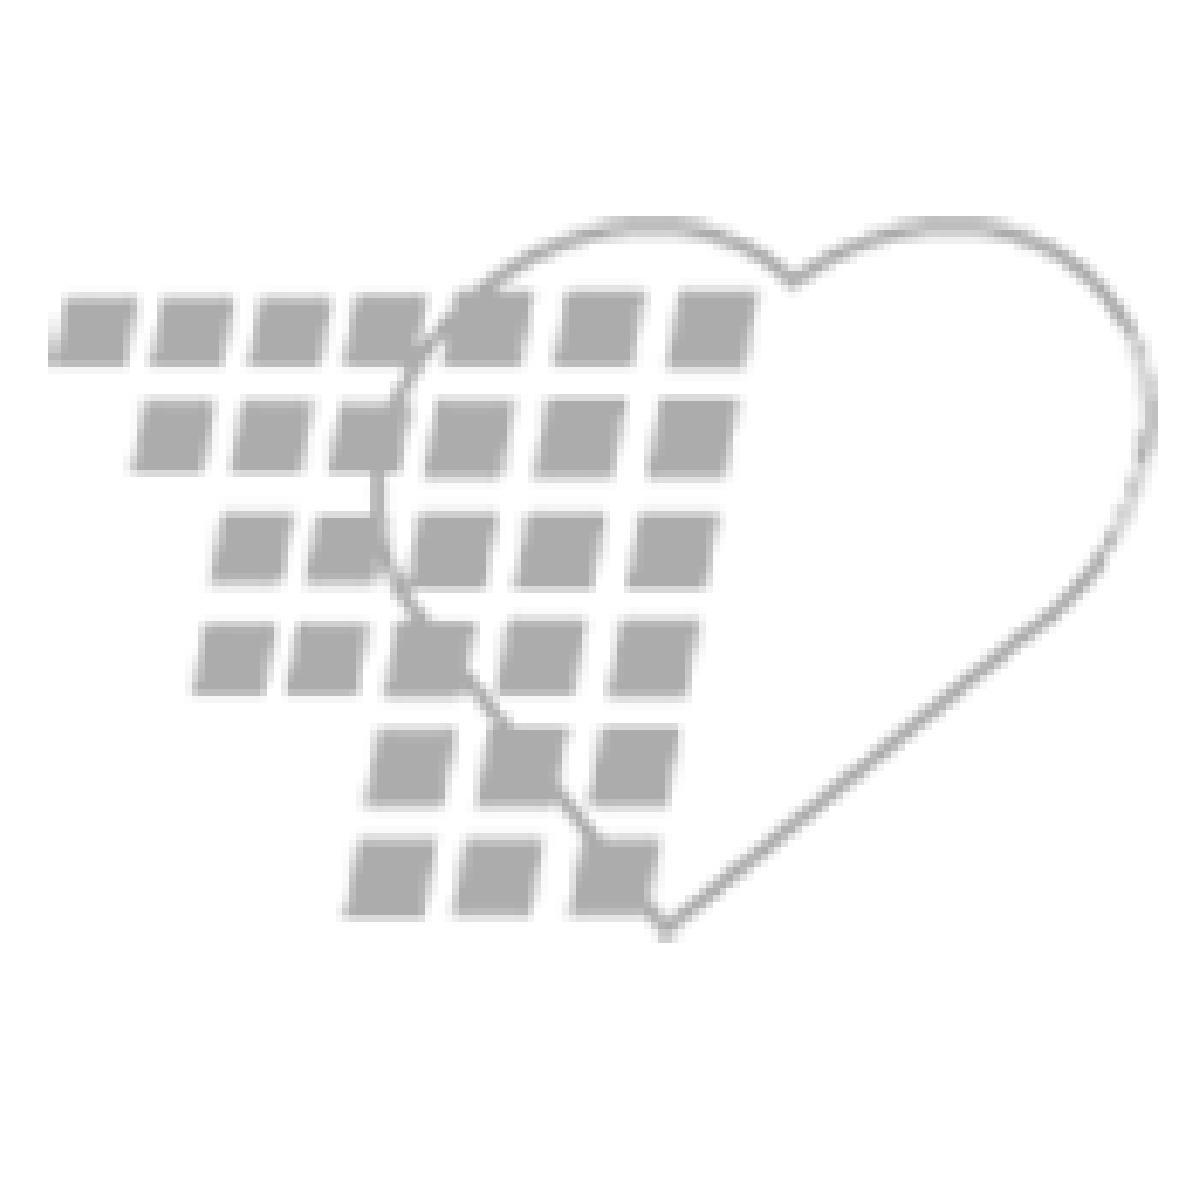 06-93-8002 Demo Dose® Fluorauracl (Adrucl) 10 mL 500 mg/10 mL